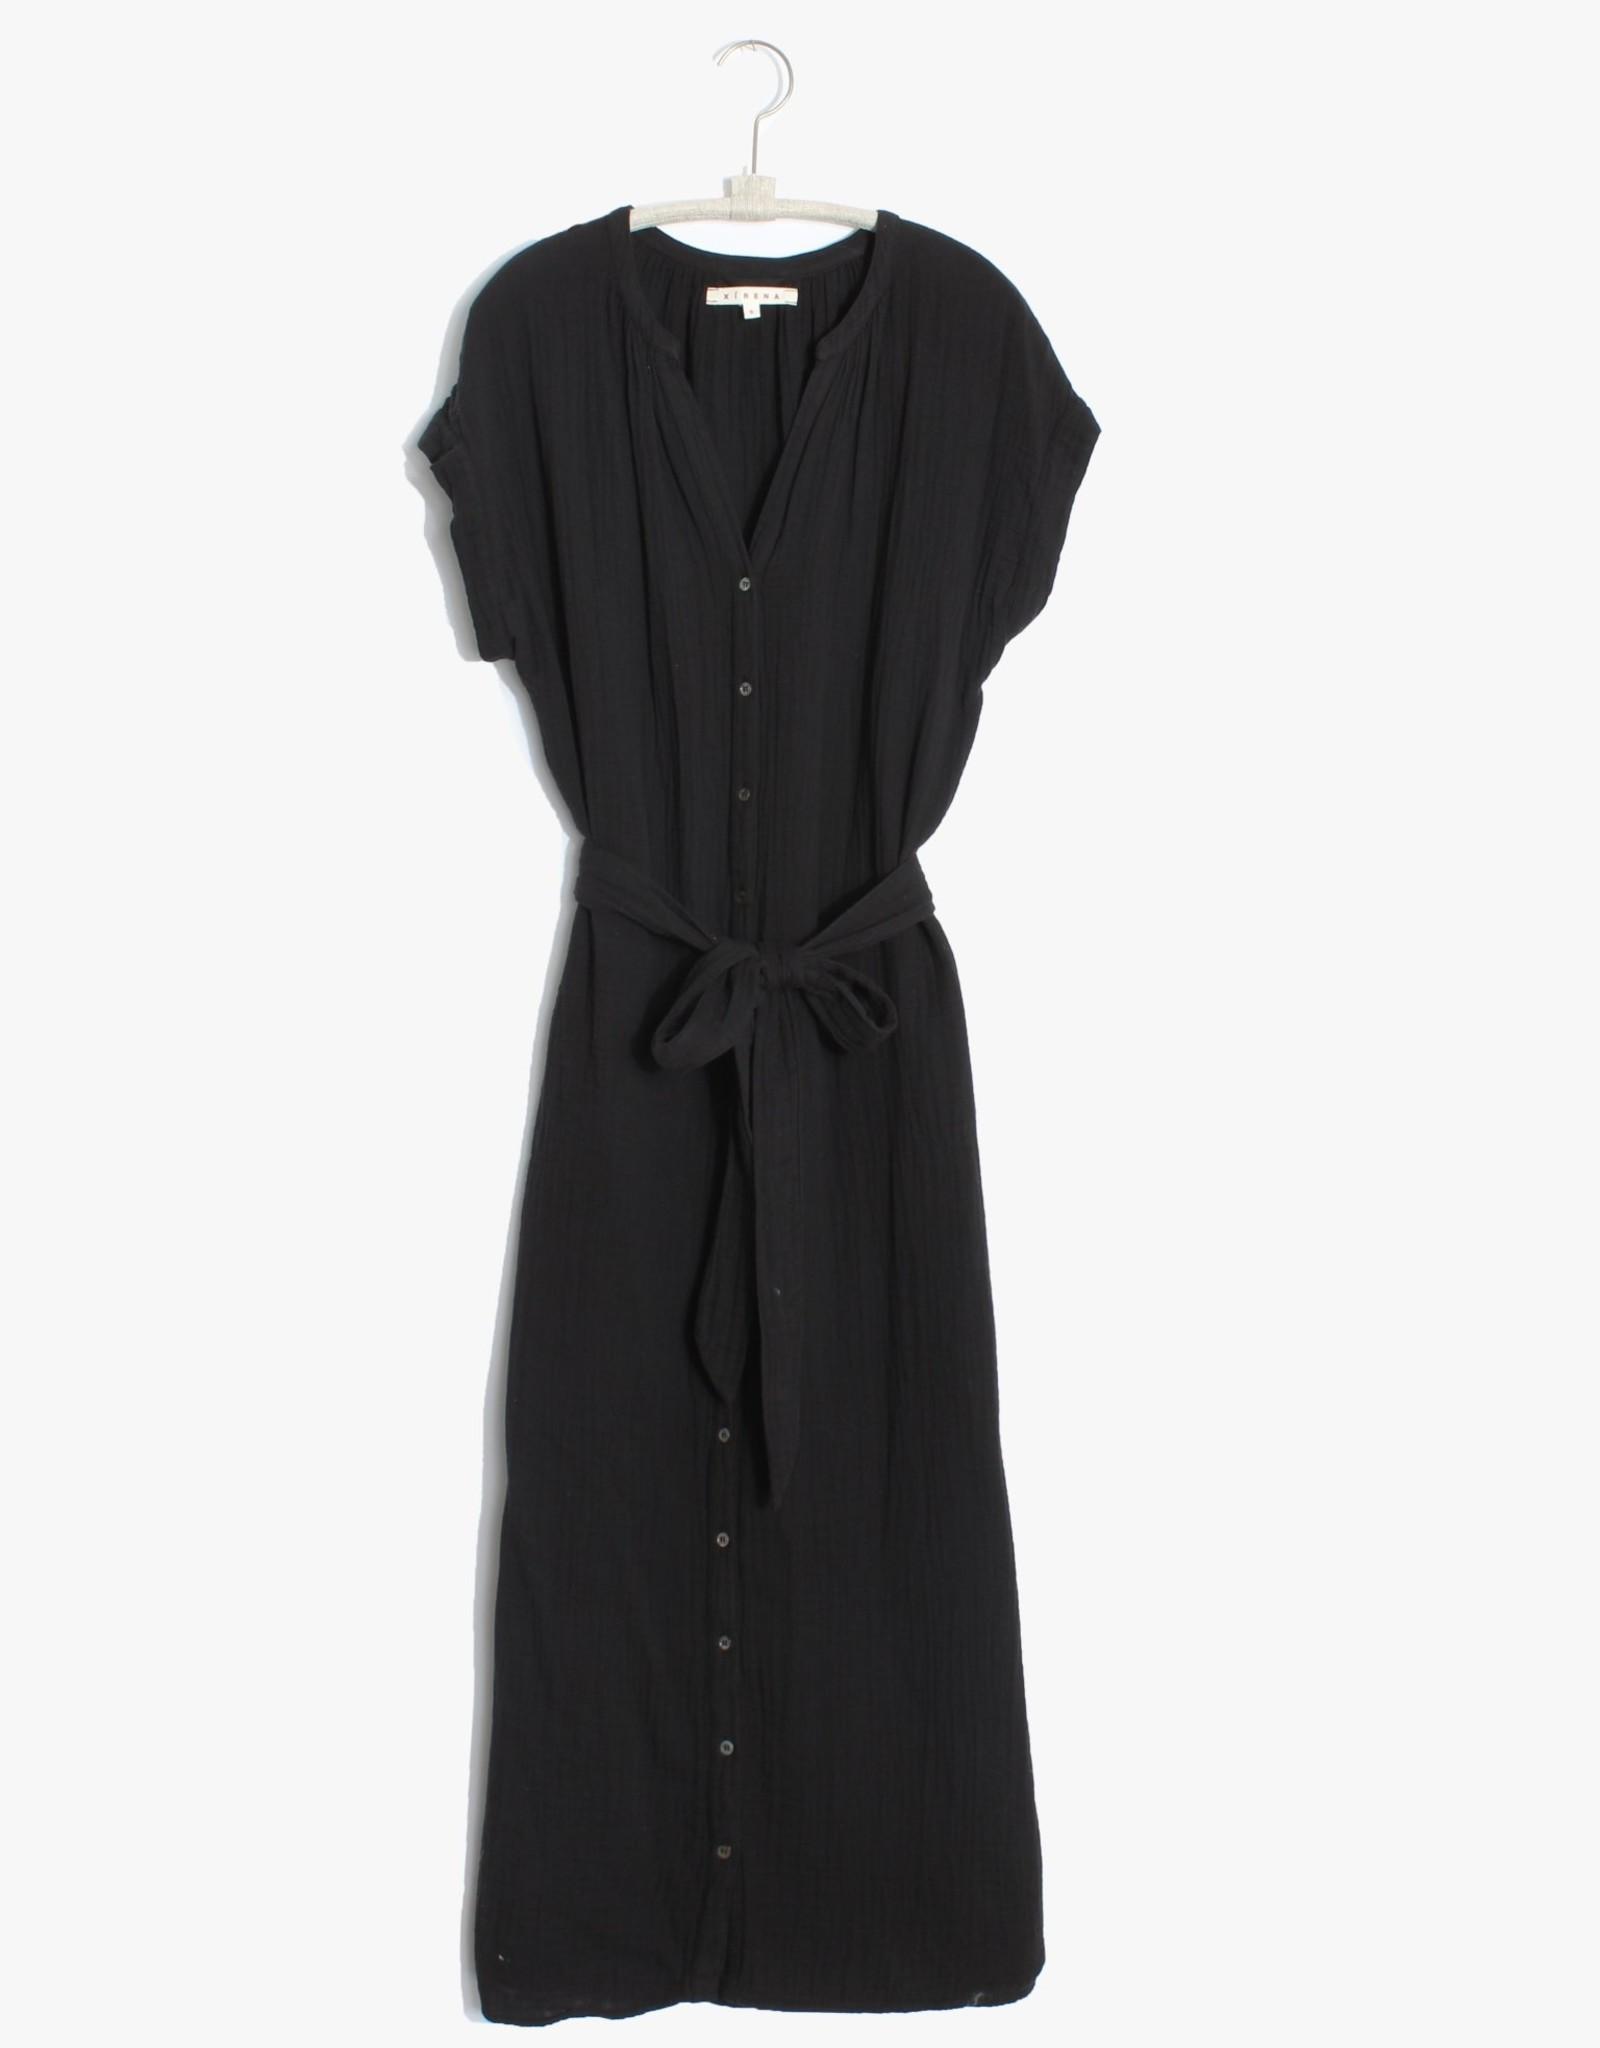 Xirena Xirena Samantha Dress